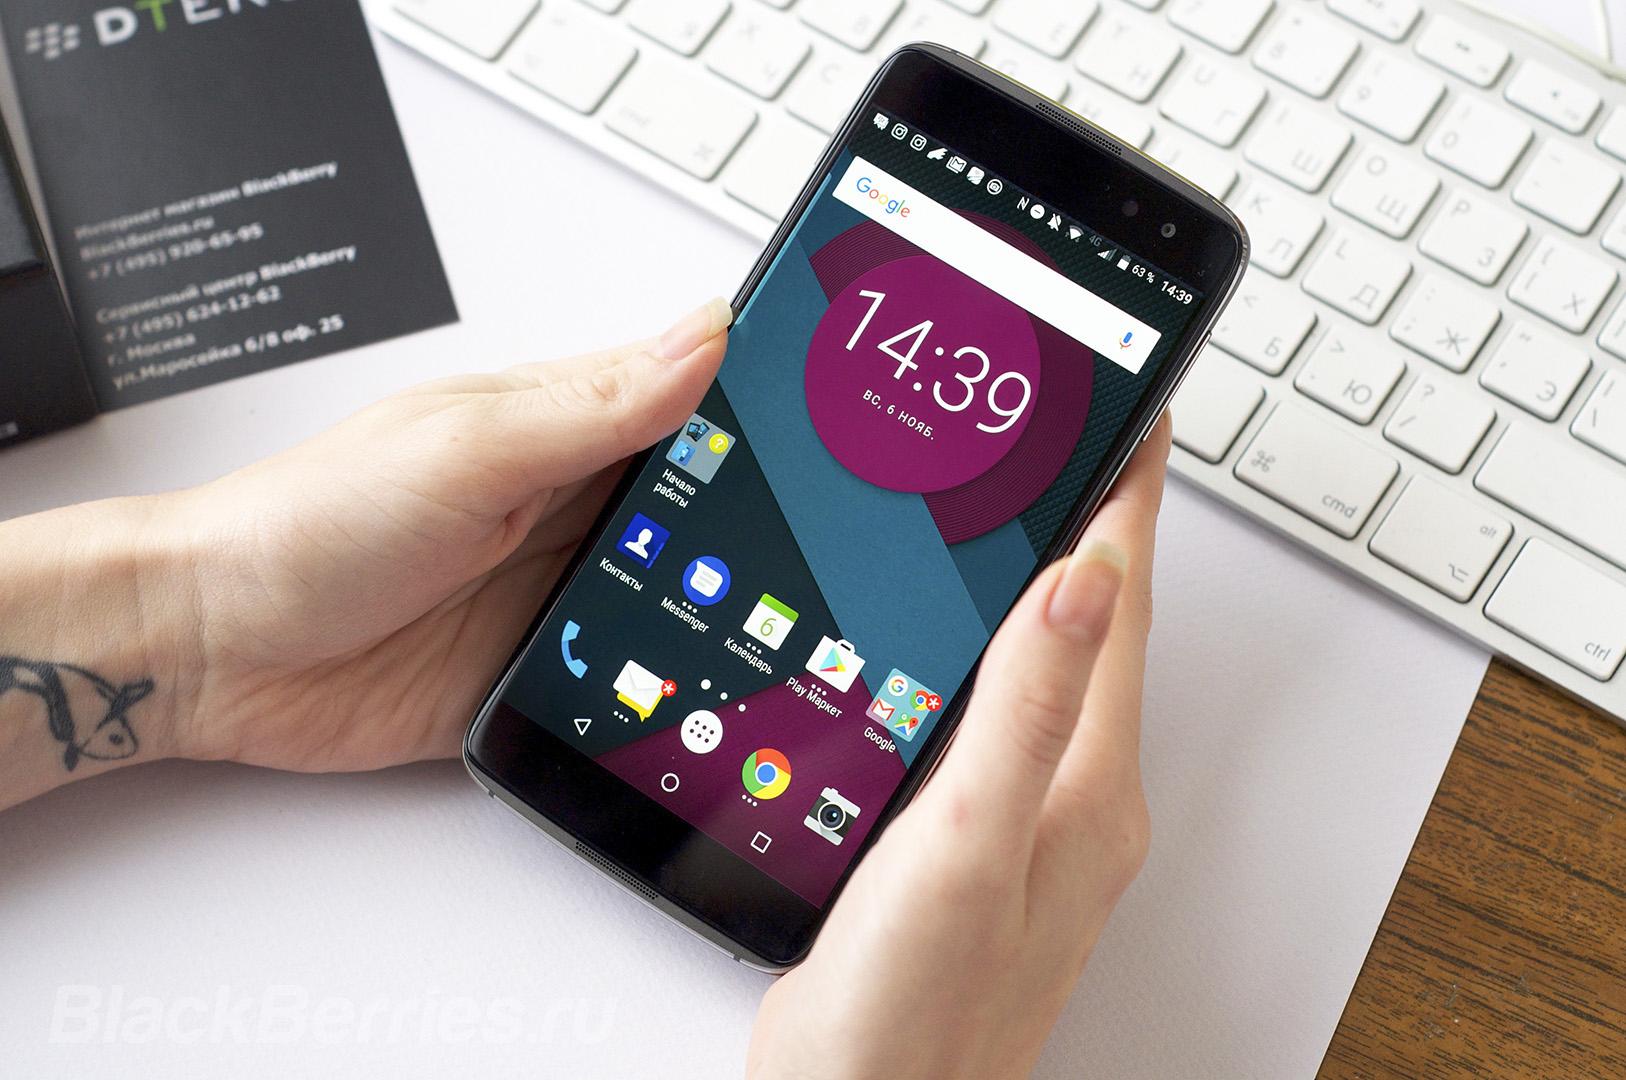 blackberry-dtek60-review-13